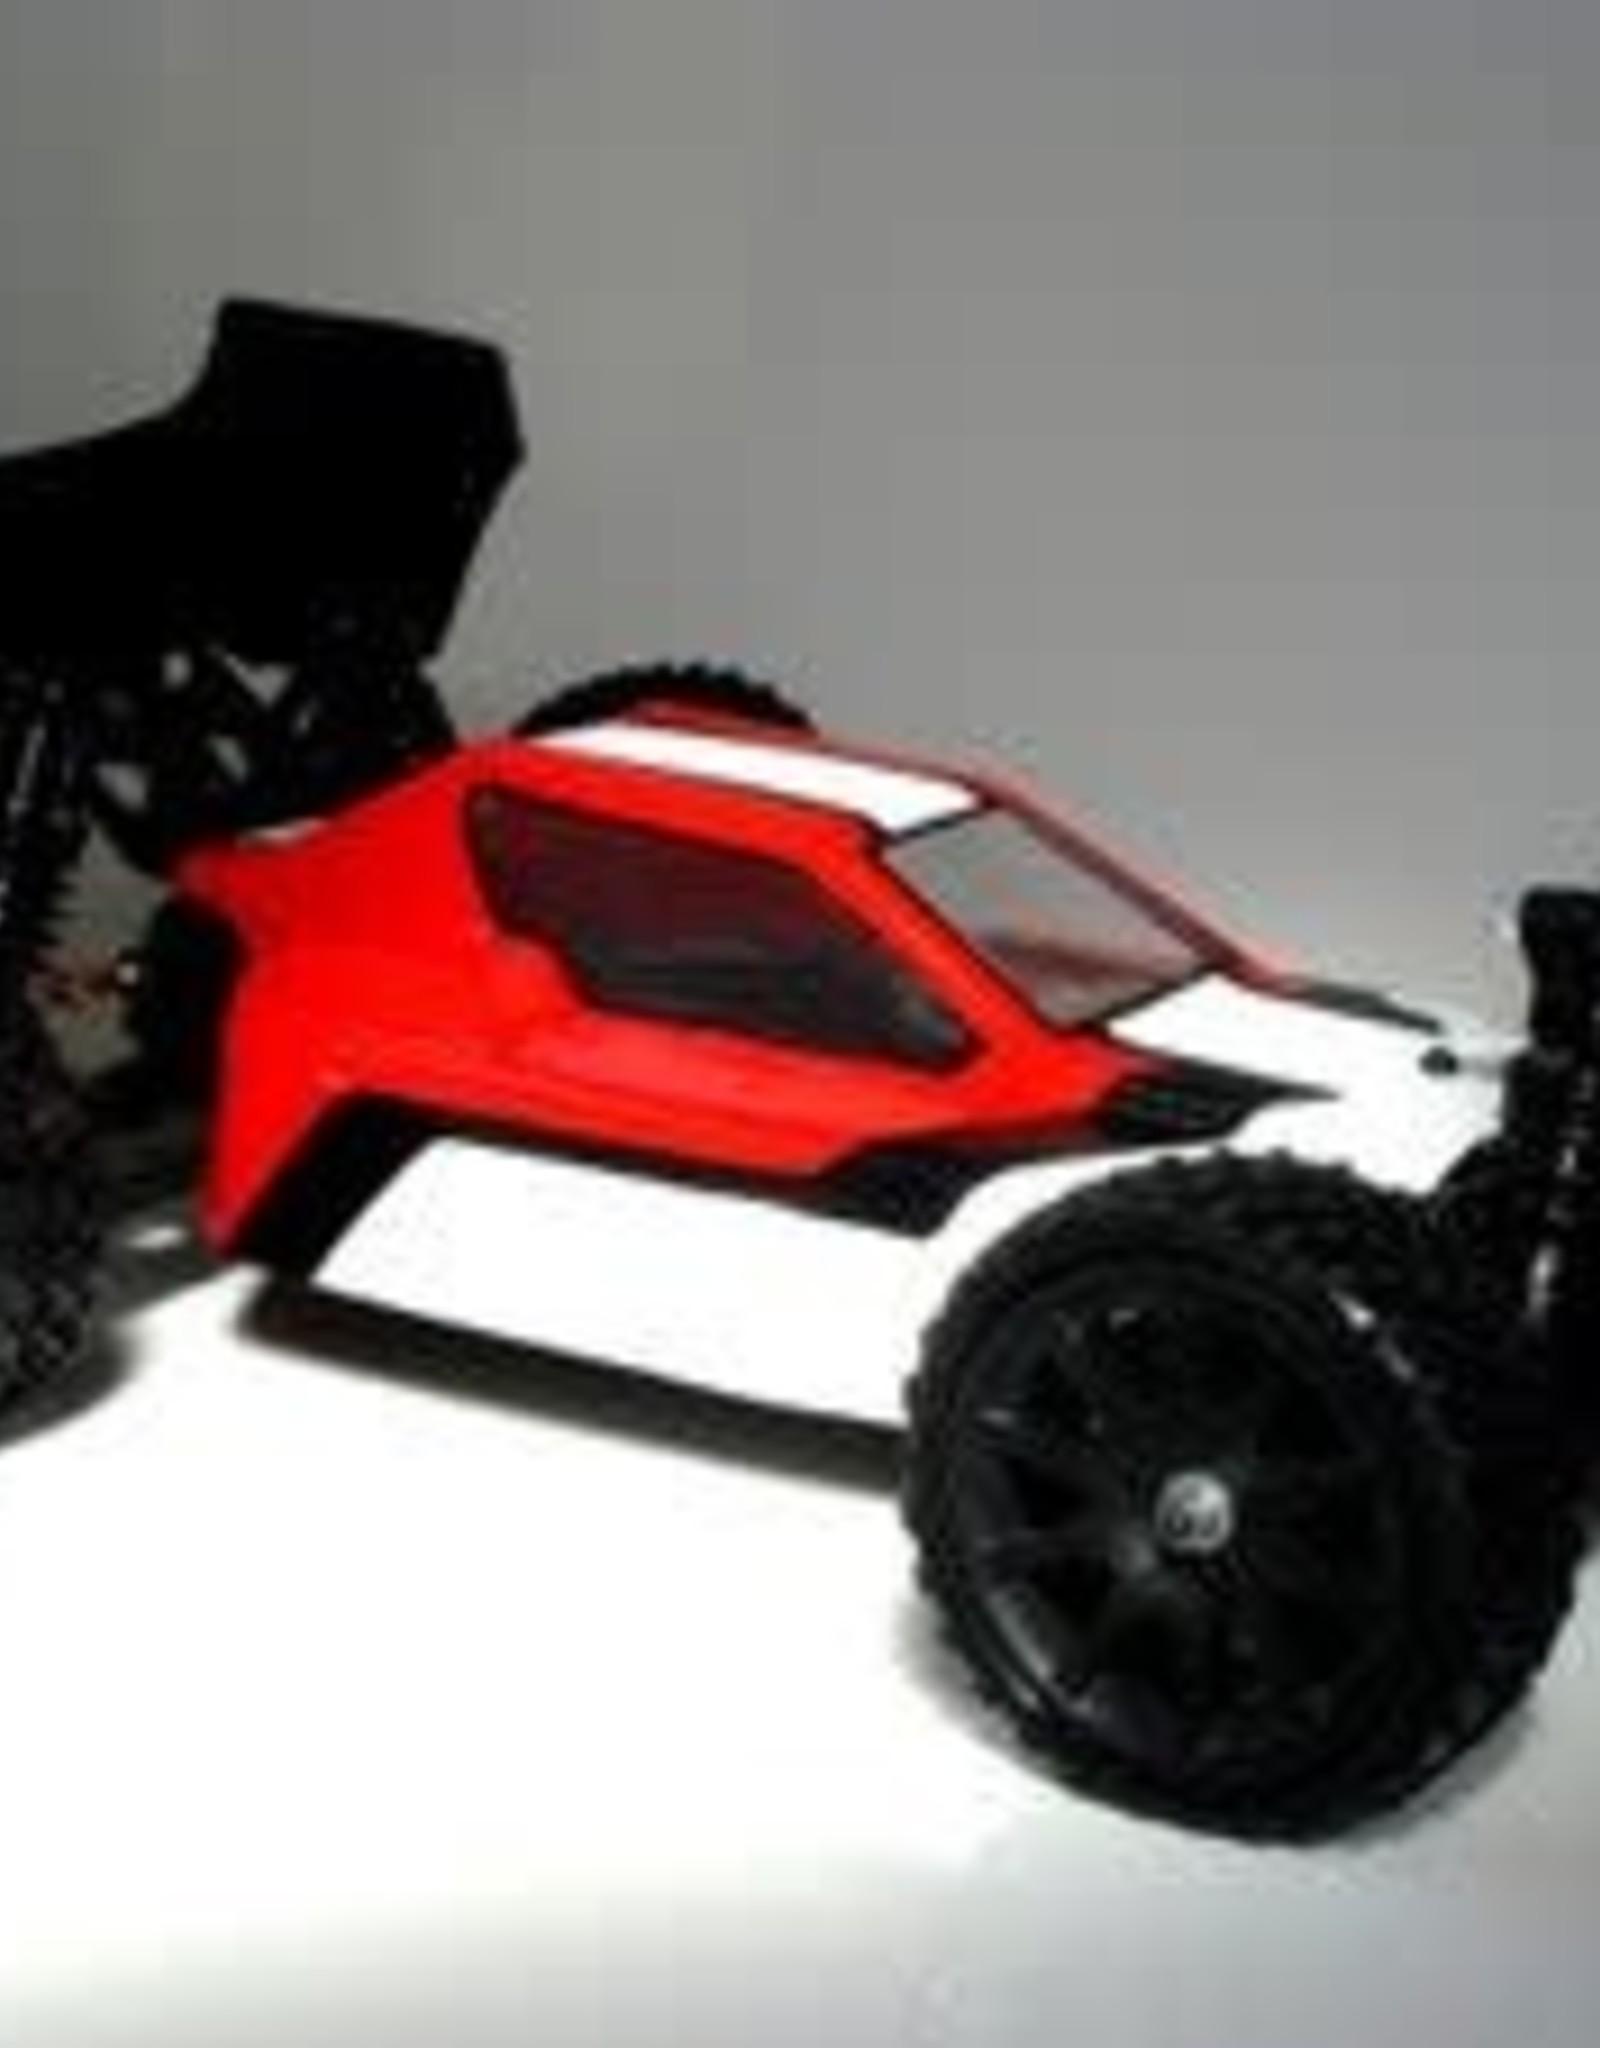 Phat Bodies Phat Bodies 'TURBO' for Losi Mini-8IGHT Associated 14B Schumacher LC Racing EMB-1